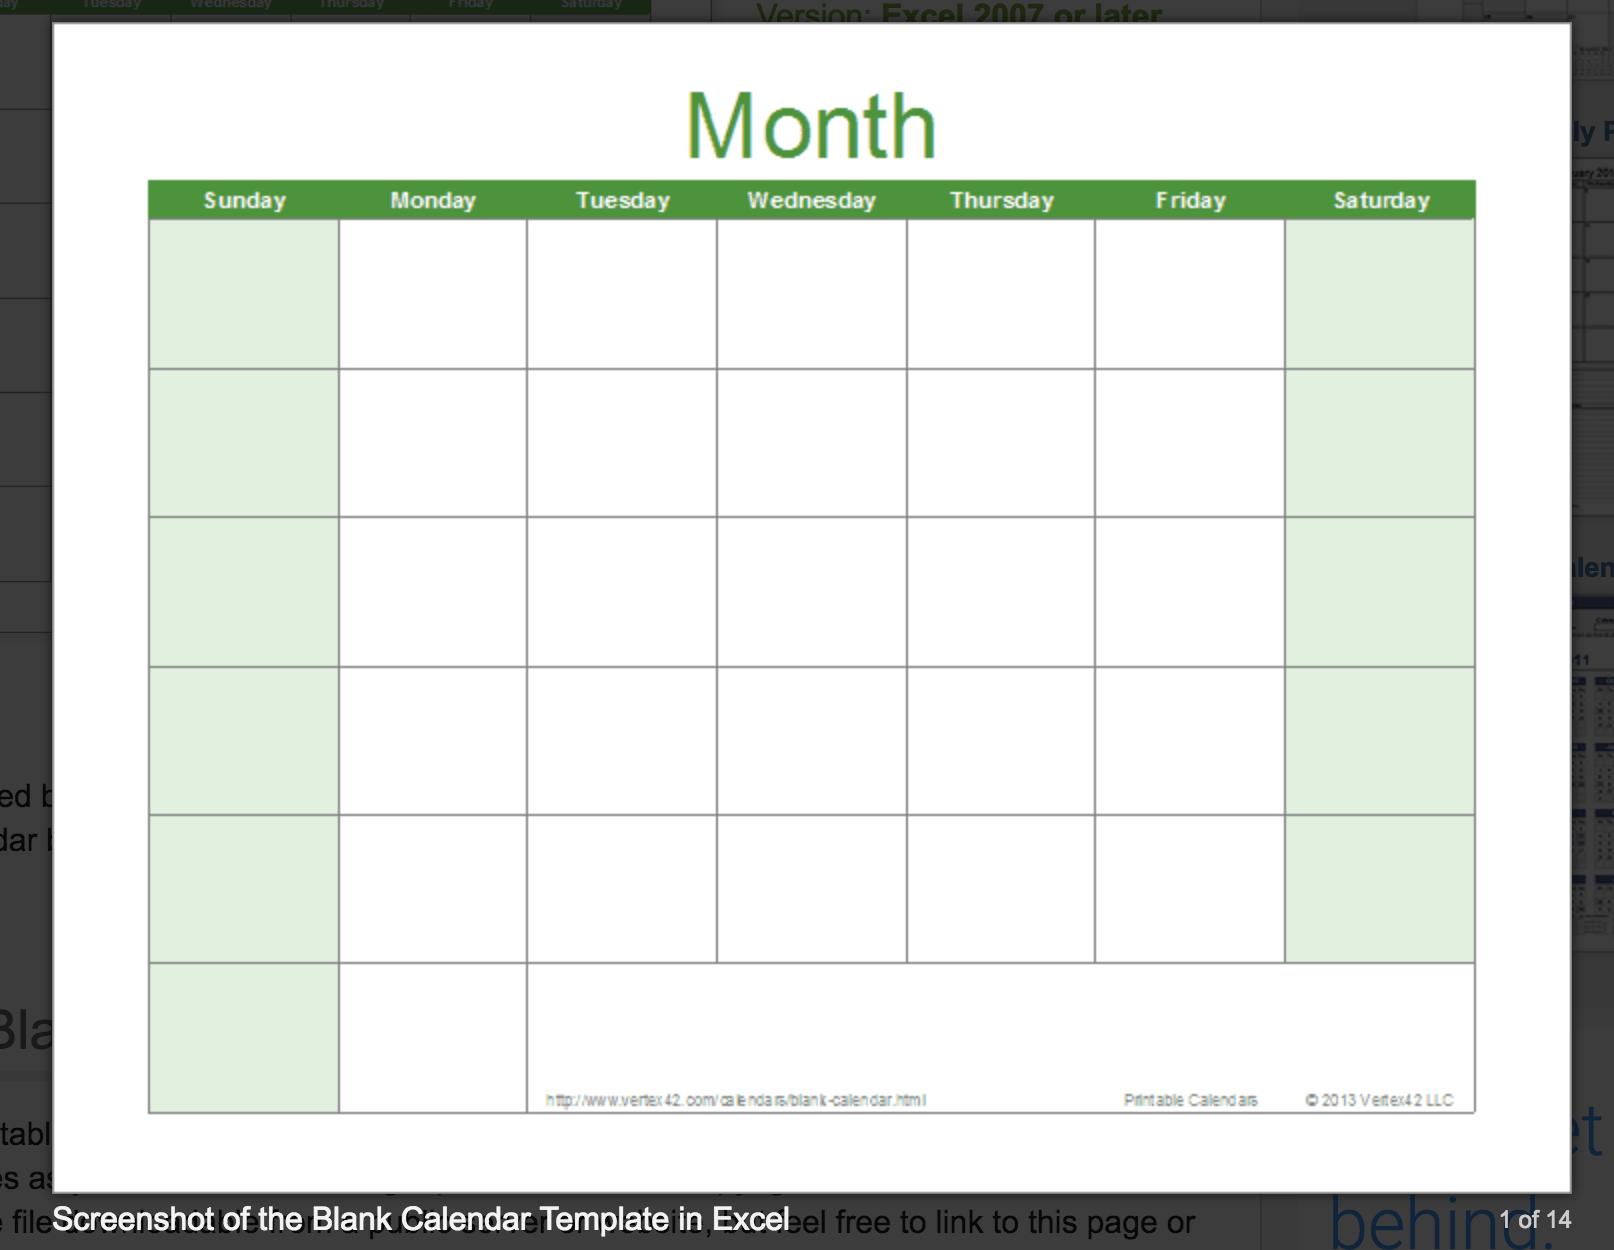 Blank Calendar: Wonderfully Printable 2019 Templates throughout 1 Month Calendar Printable Blank